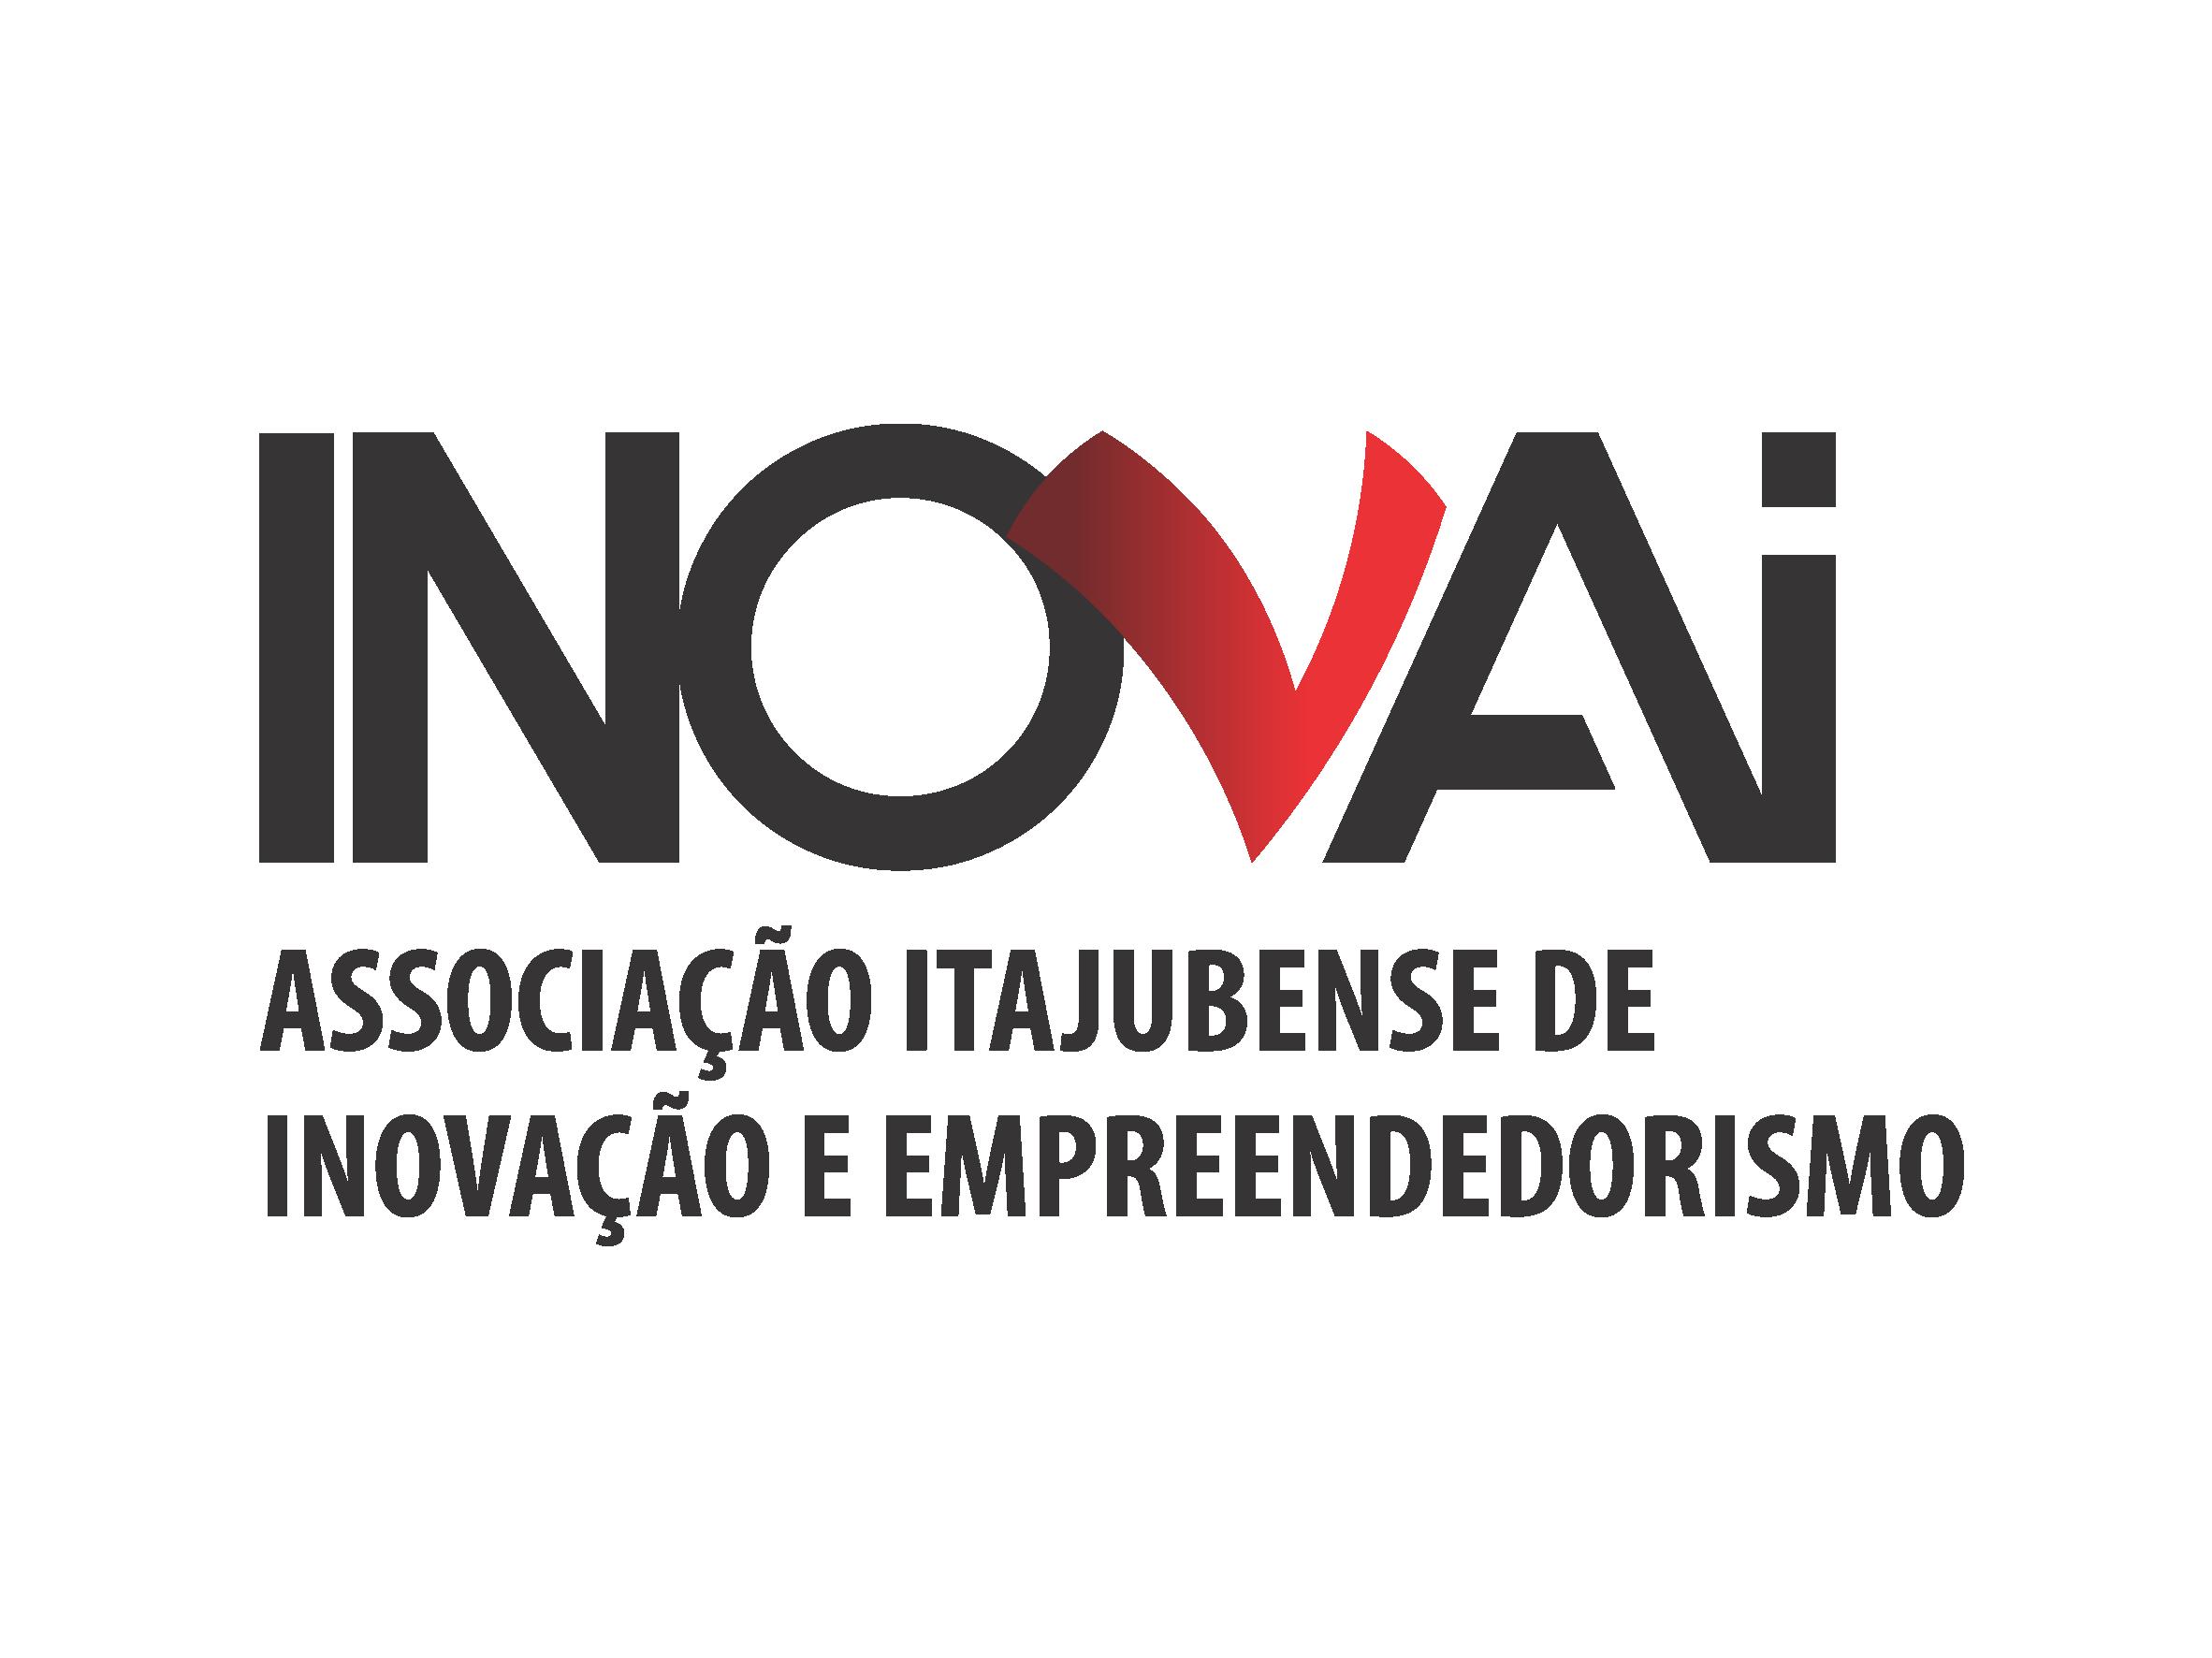 Logotipo Inovai